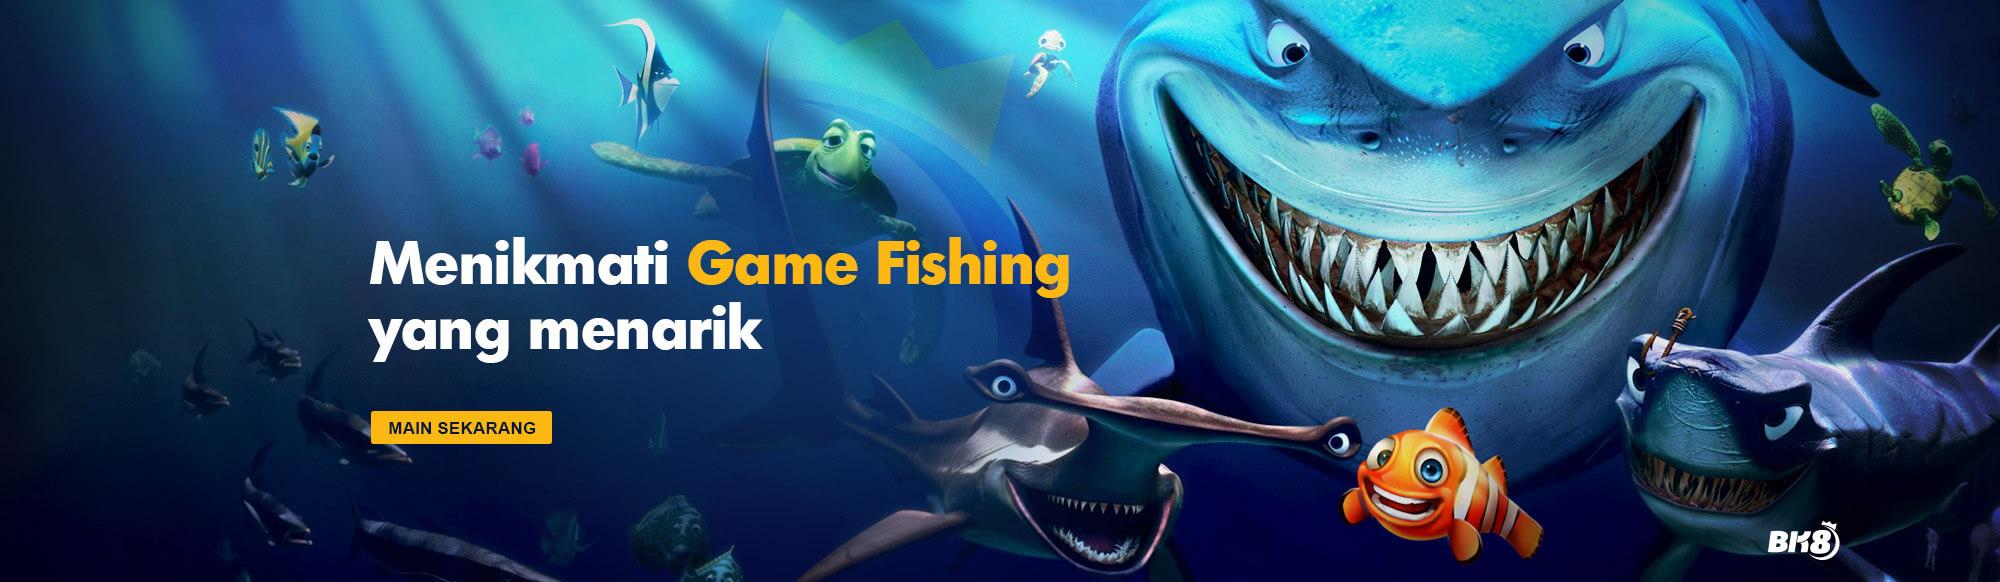 Online Game Fishing Malaysia